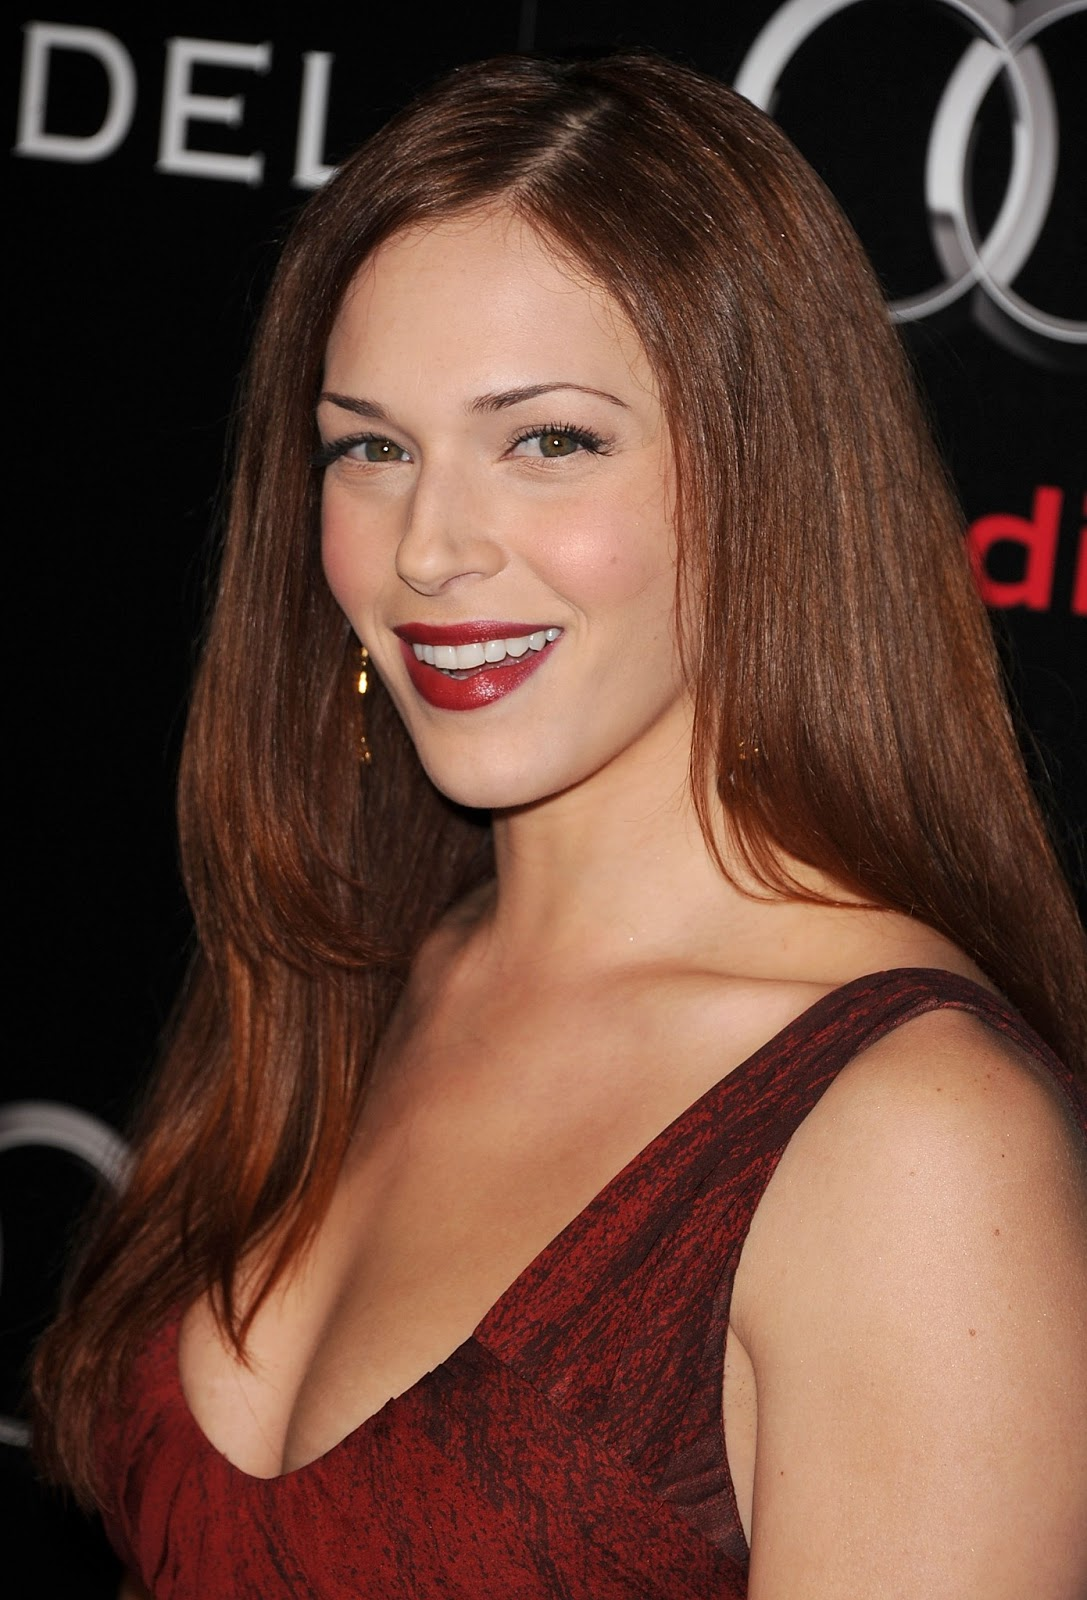 Hollywood Celebrities: Amanda Righetti hot hd wallpapers